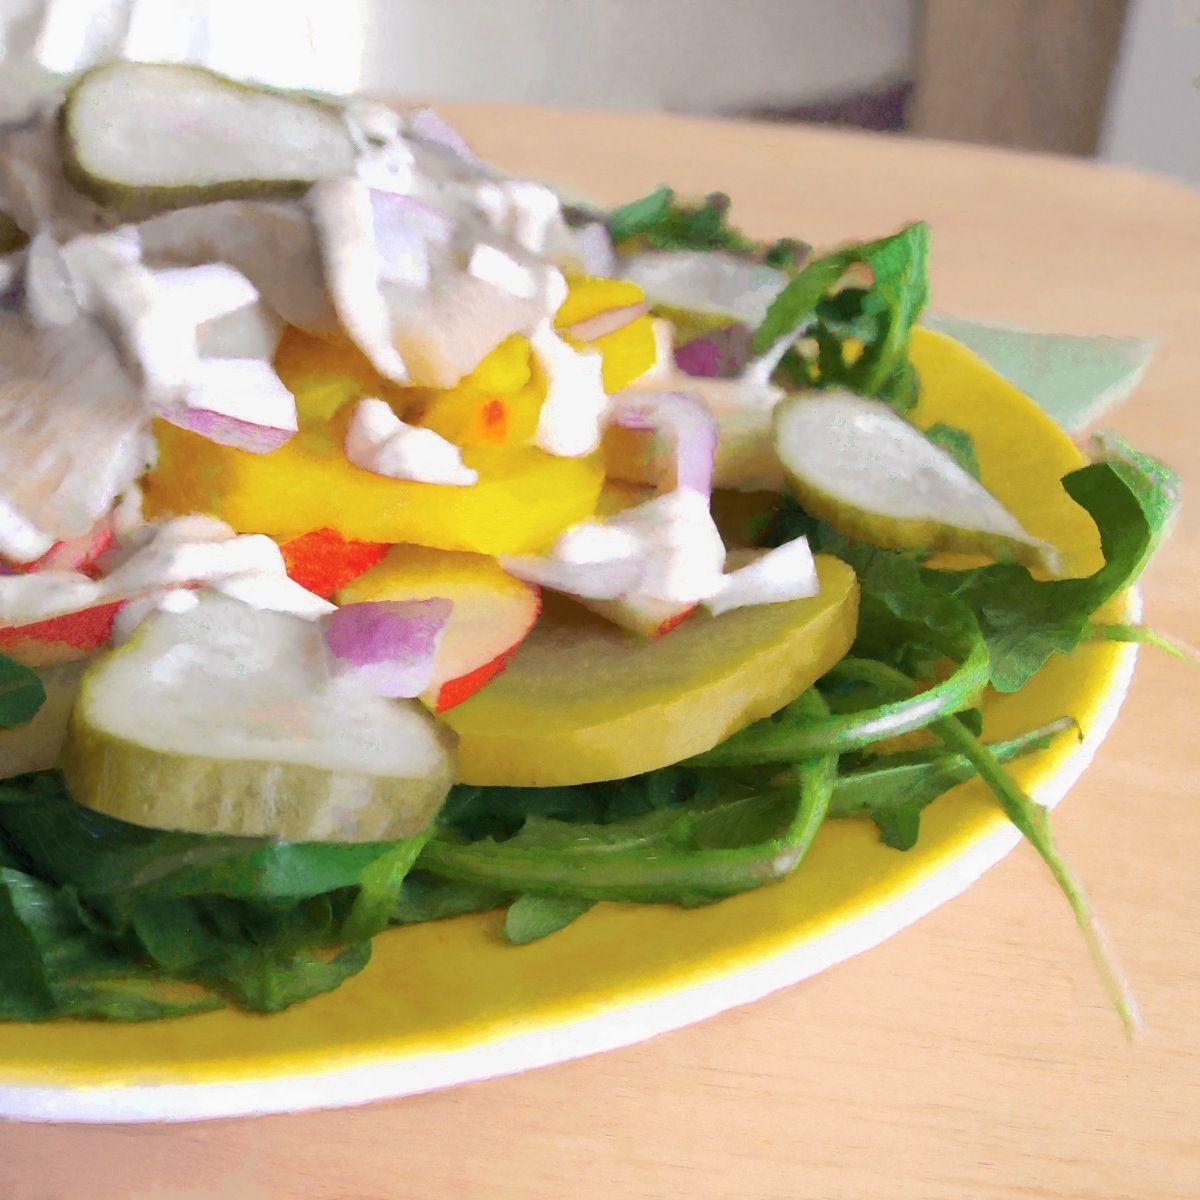 Herring, Apple, And Beet Salad With Horseradish-Sour Cream